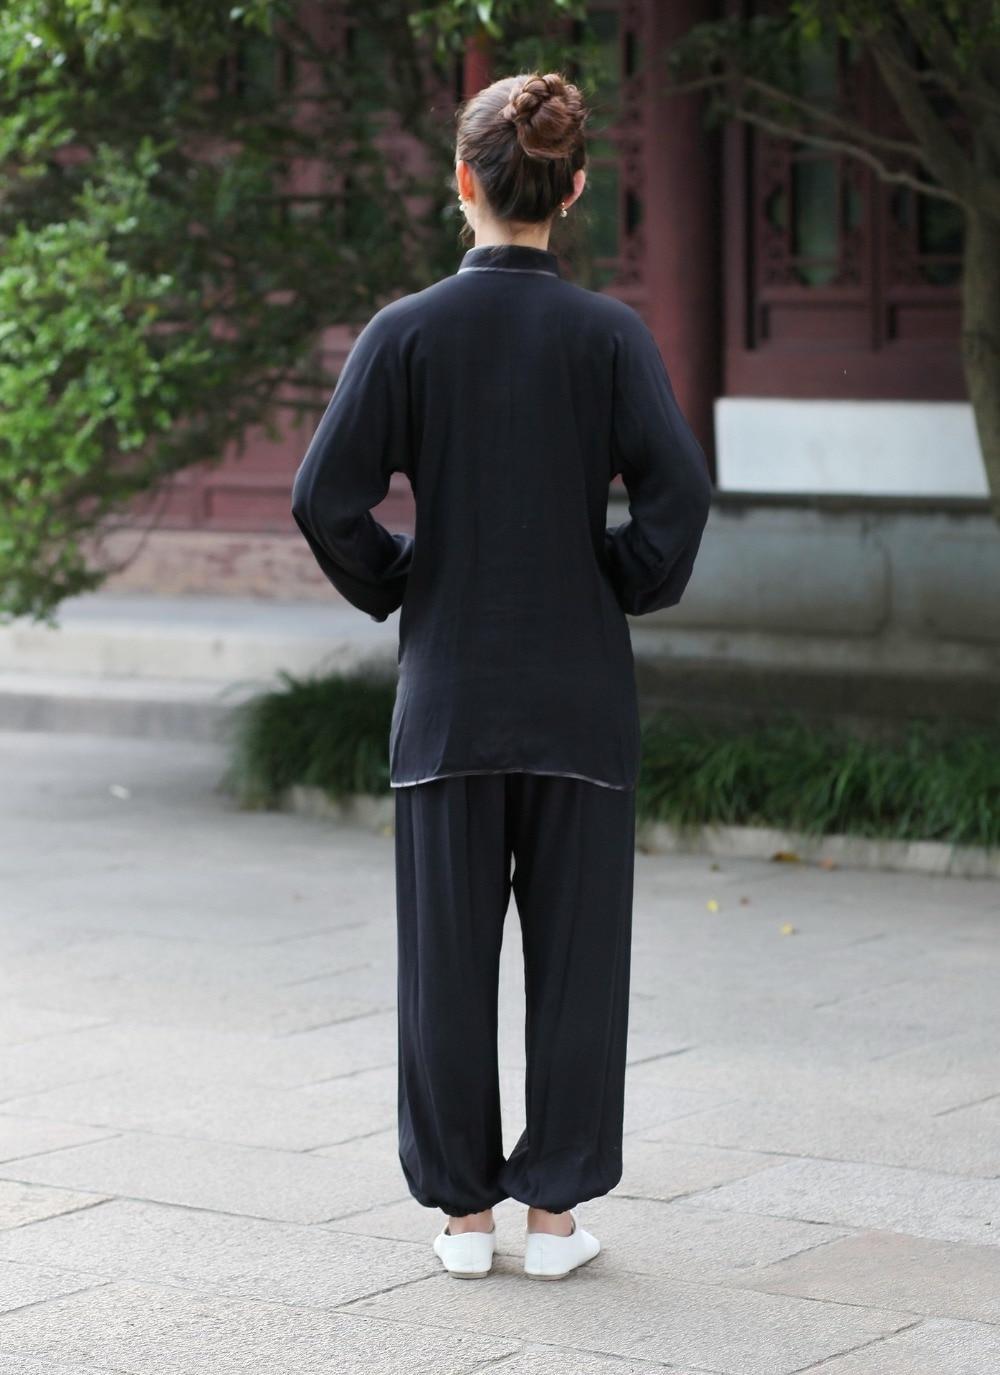 Kung beige Taiji Chinese Uniform Cotton Story Sale Red Women blue Wushu Art Fu Suit 100 Chi Tai white black Clothing New Shanghai ZqIpwx1x